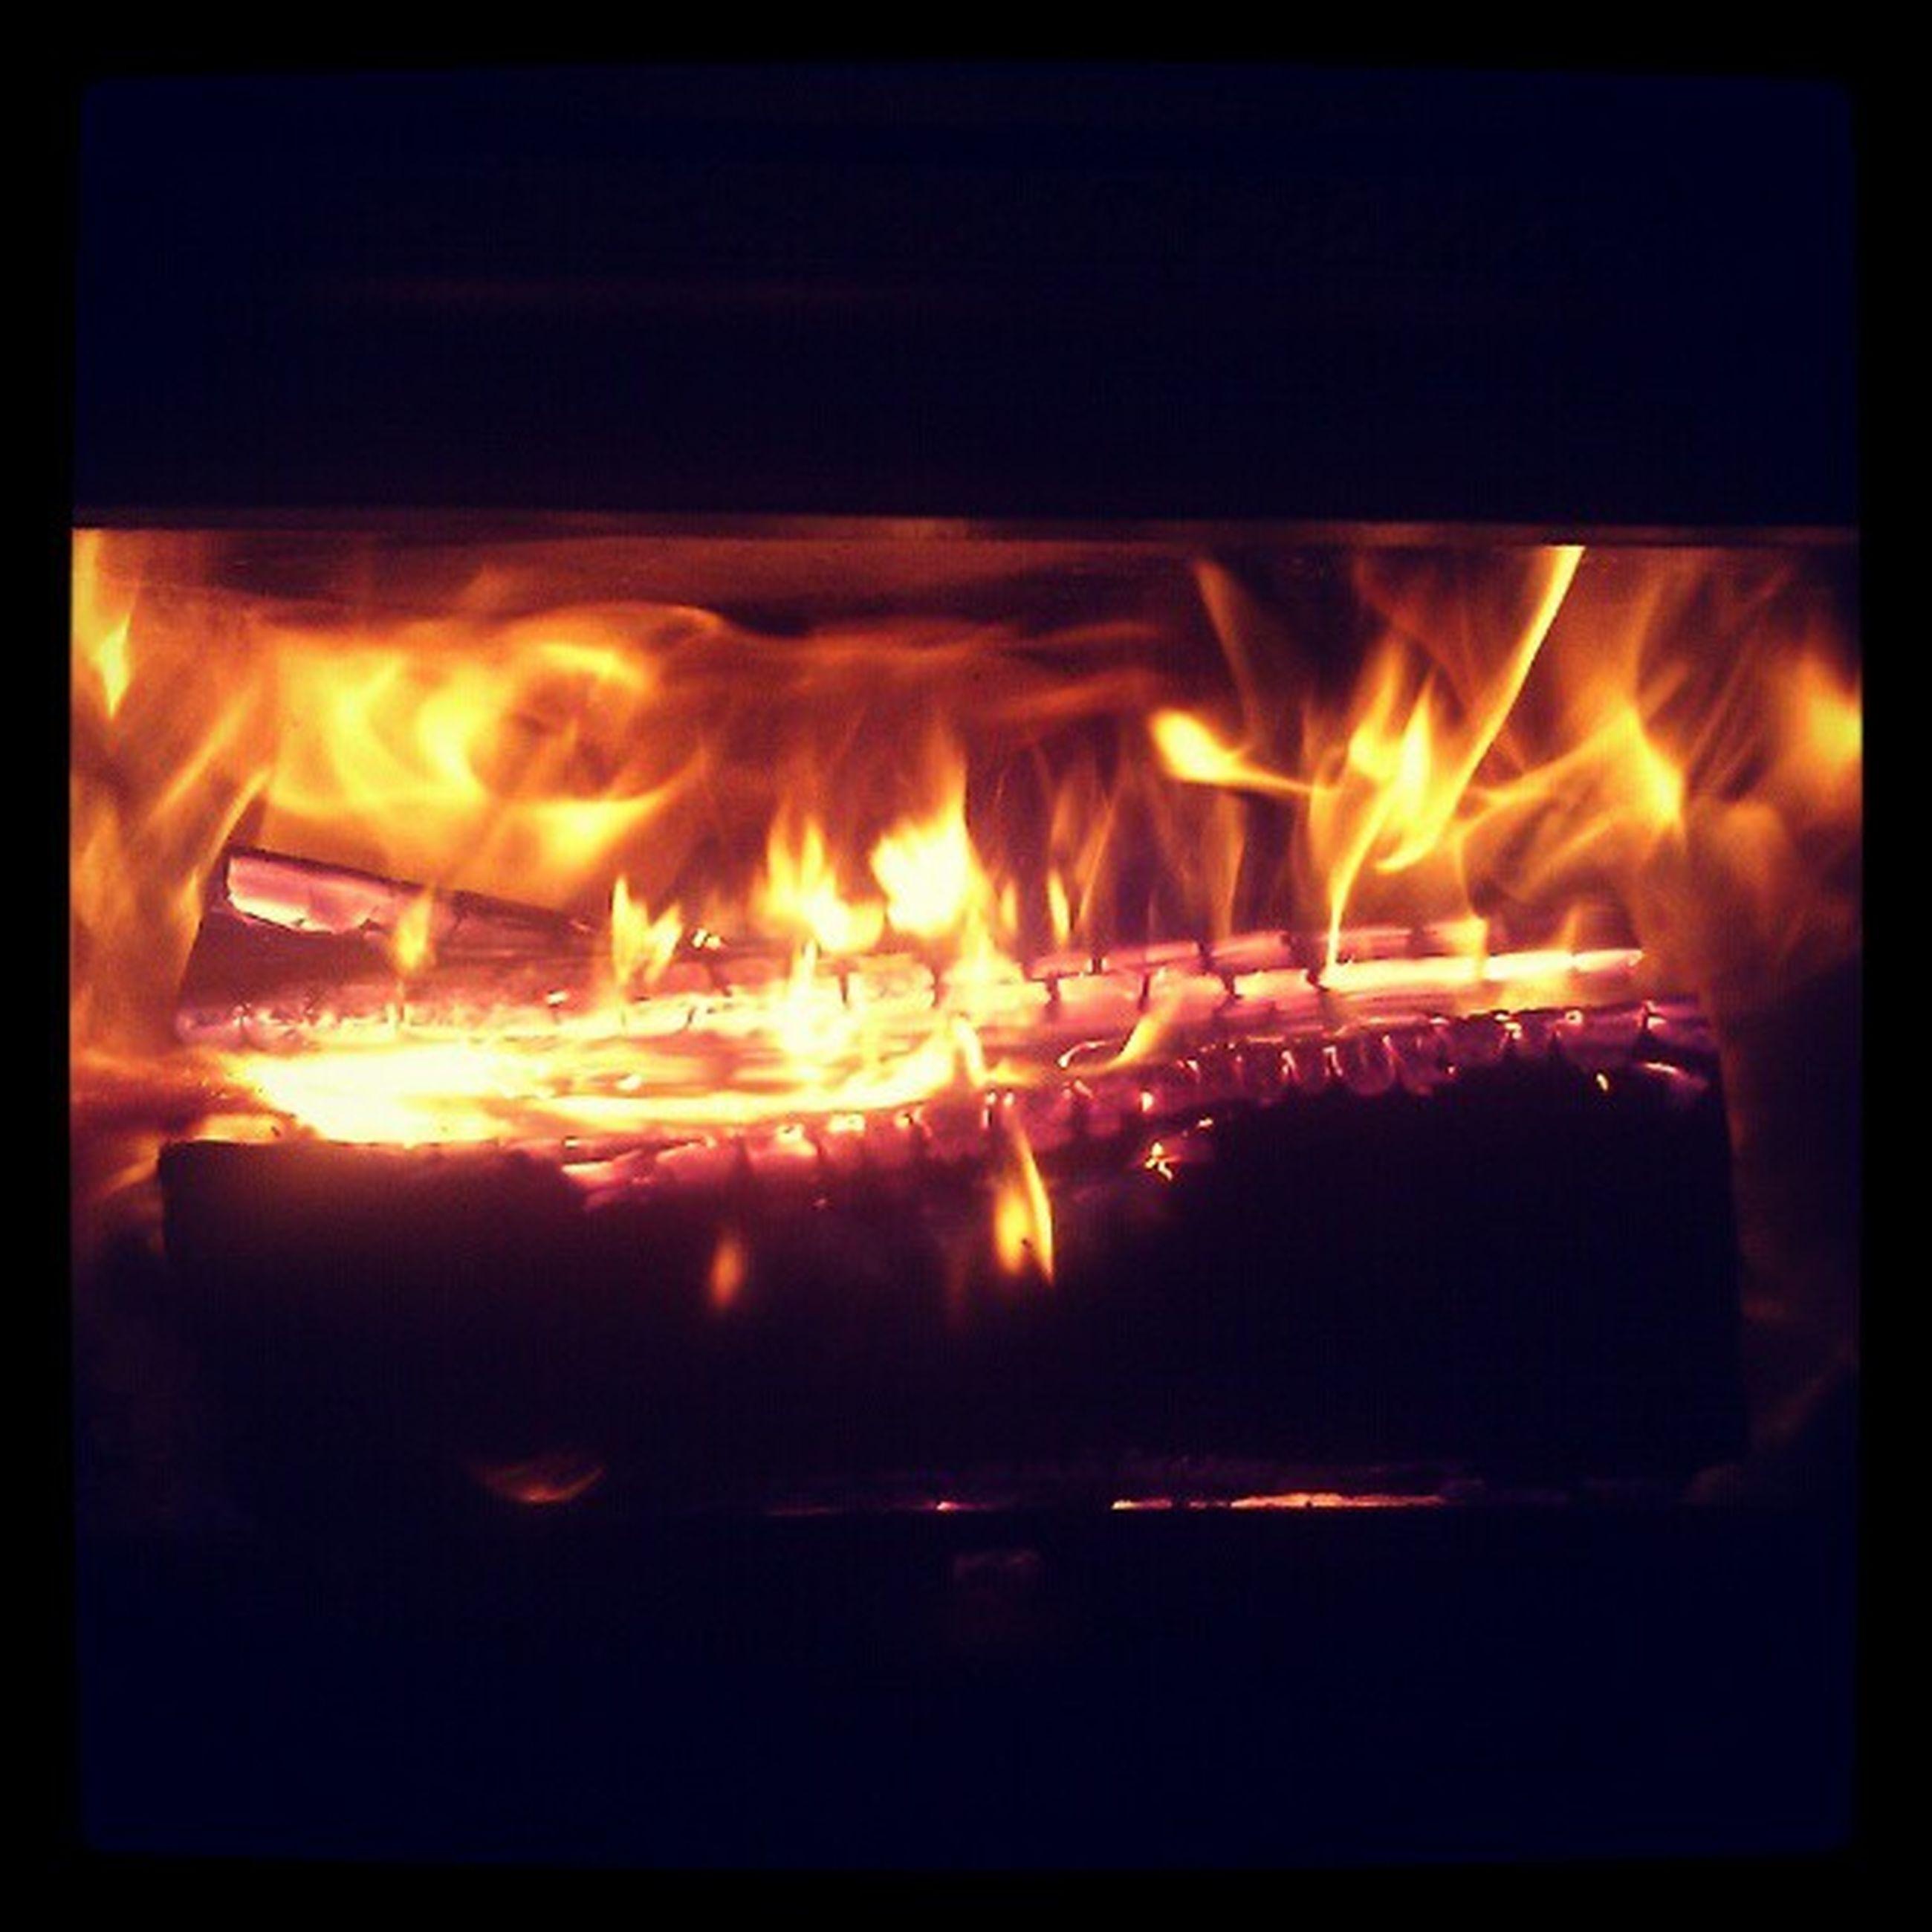 flame, burning, fire - natural phenomenon, heat - temperature, glowing, transfer print, fire, illuminated, night, indoors, bonfire, firewood, heat, auto post production filter, close-up, motion, light - natural phenomenon, orange color, campfire, dark